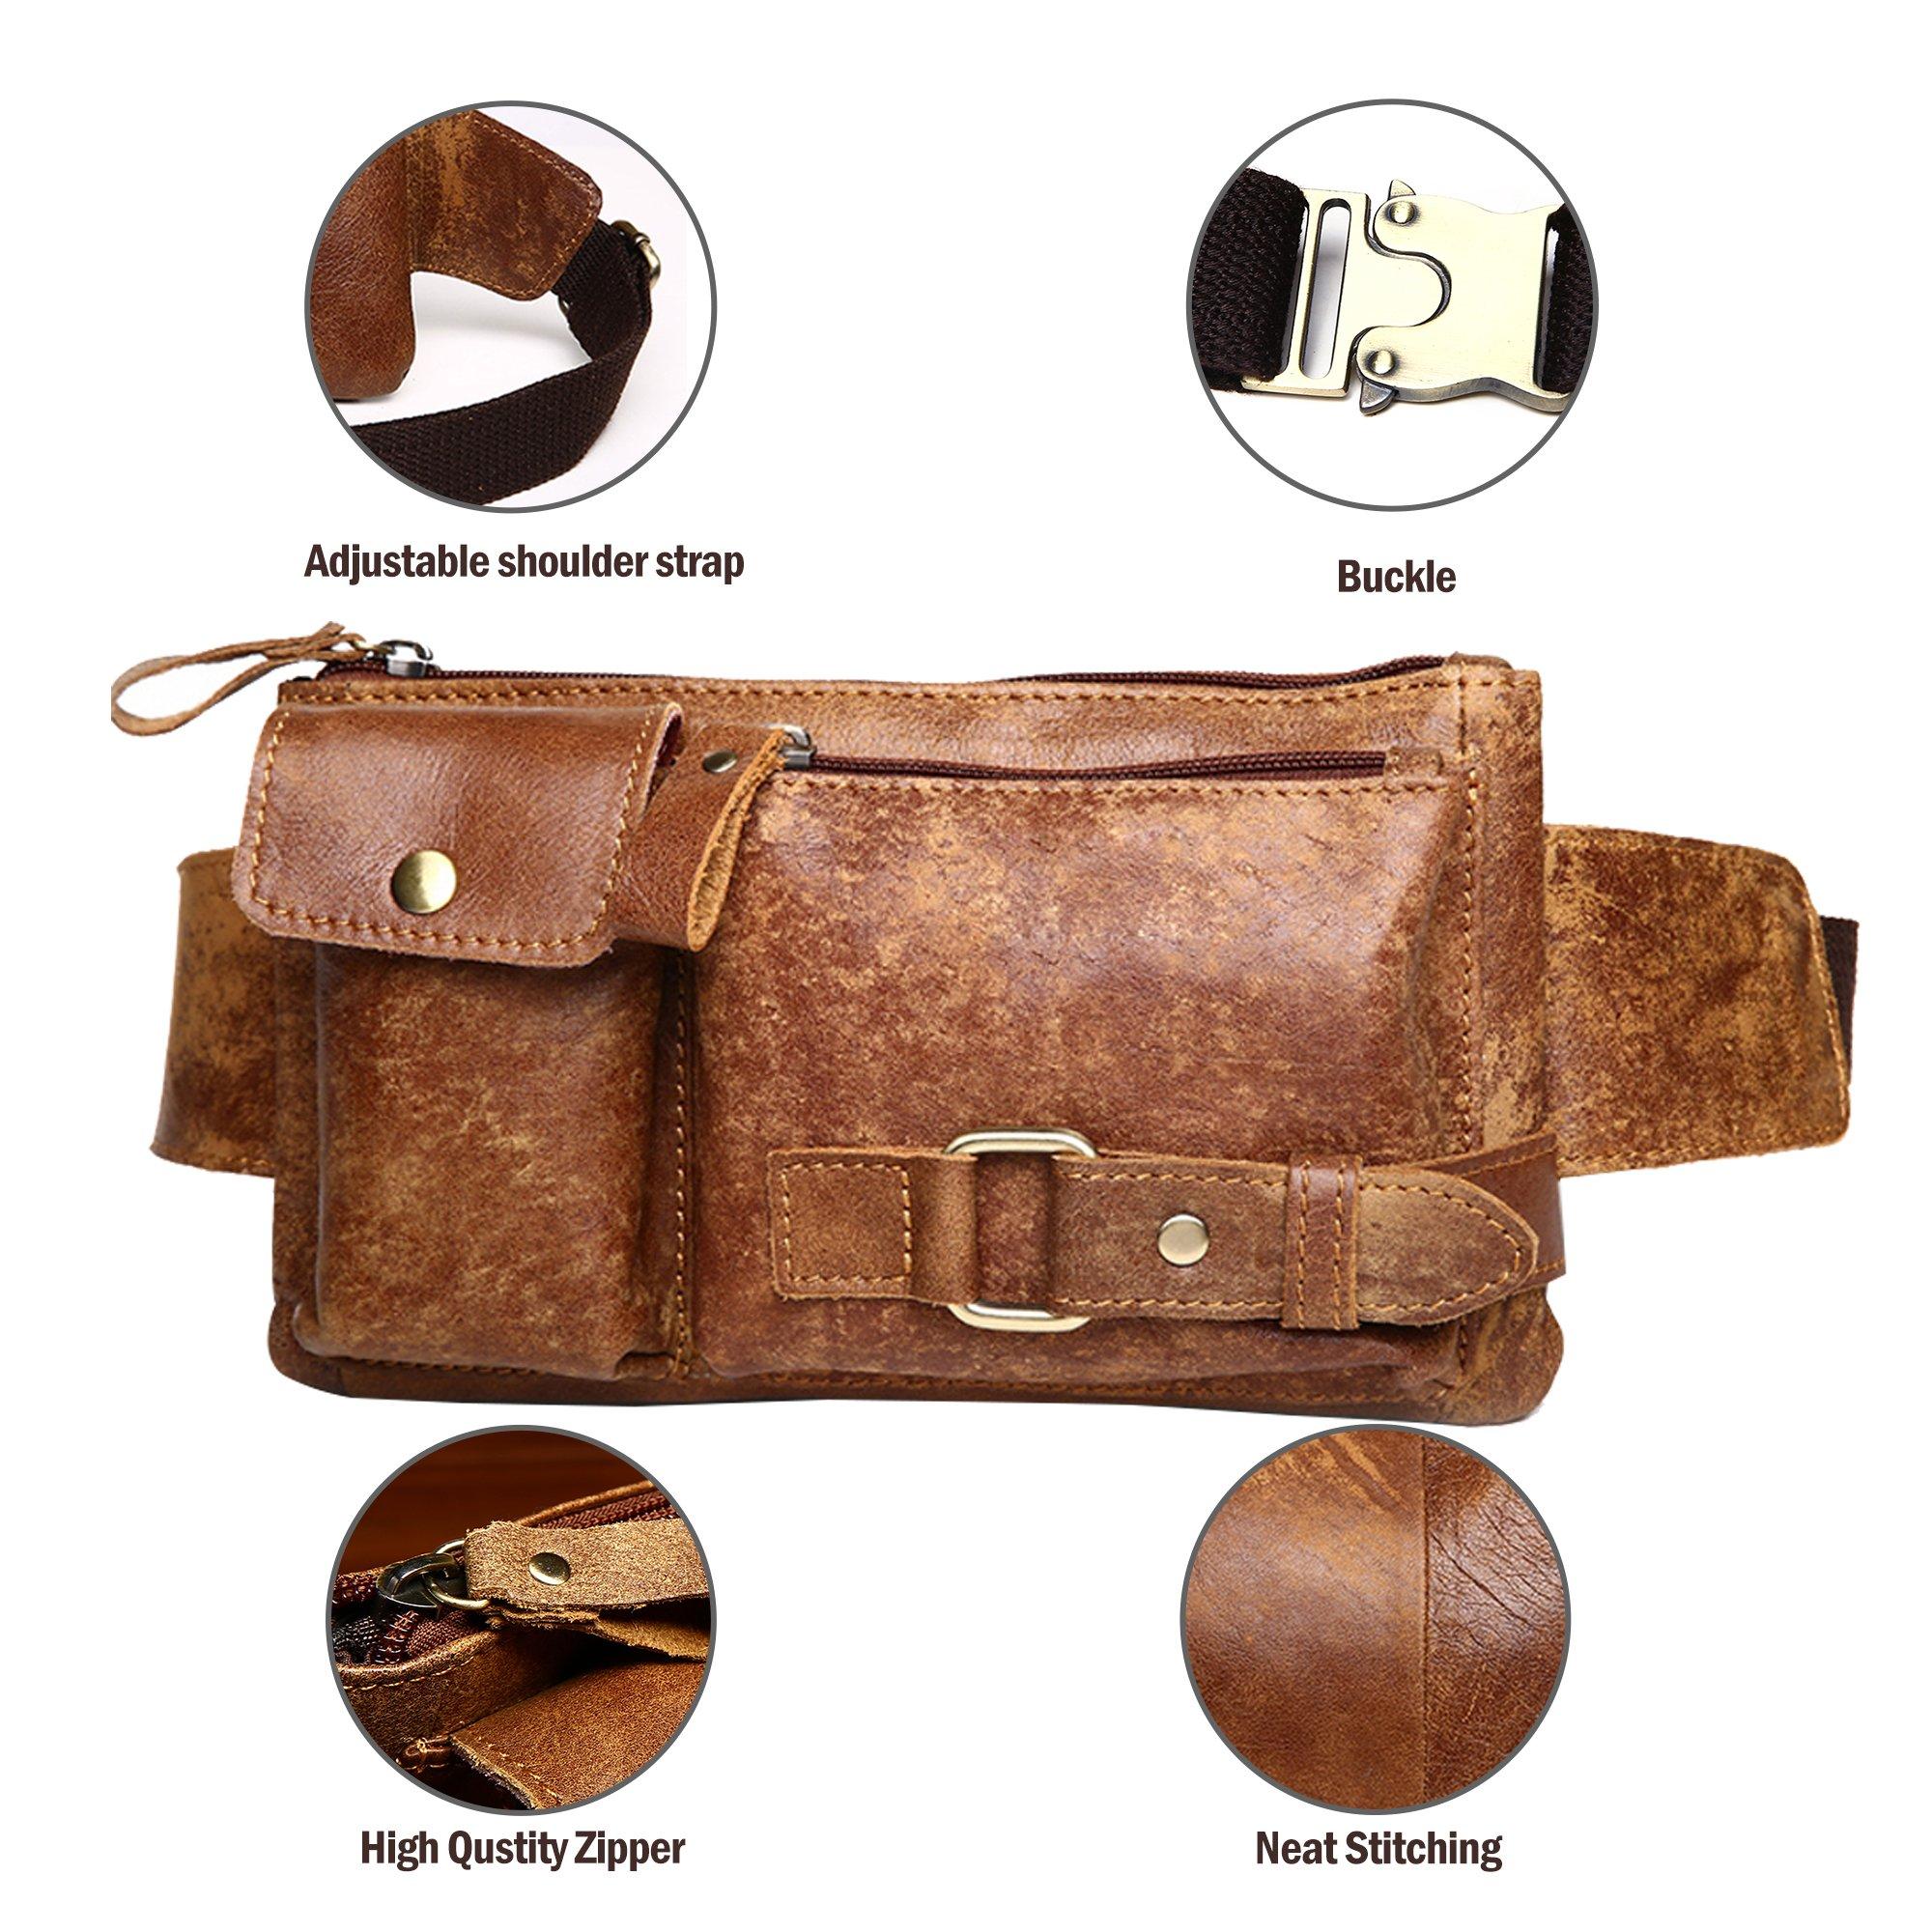 0125d70294 BISON DENIM Leather Waist Pack Fanny Pack Men's Hip Purse Travel ...